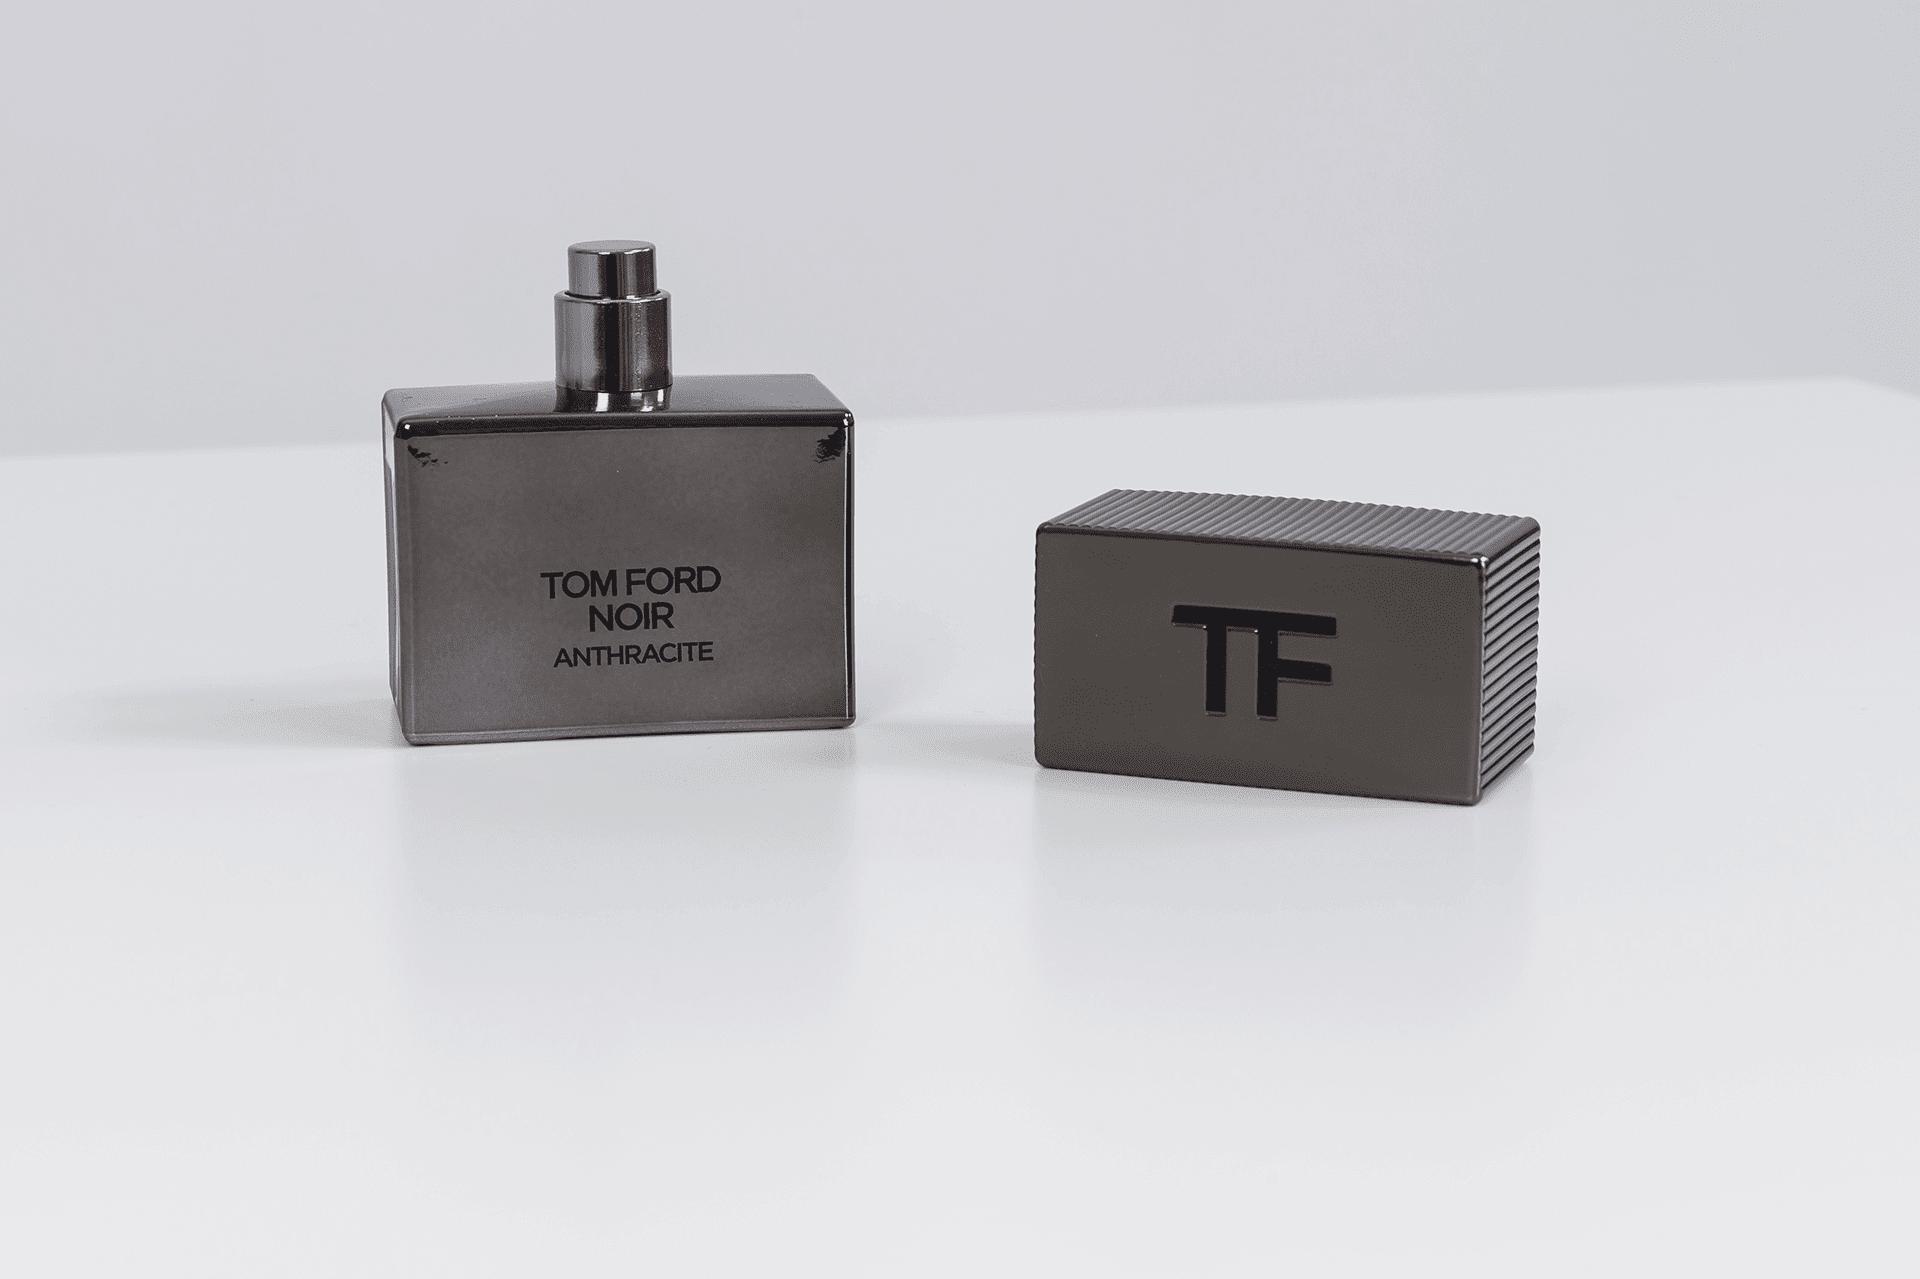 Tom Ford Noir Anthracite Fragrance - Ape to Gentleman